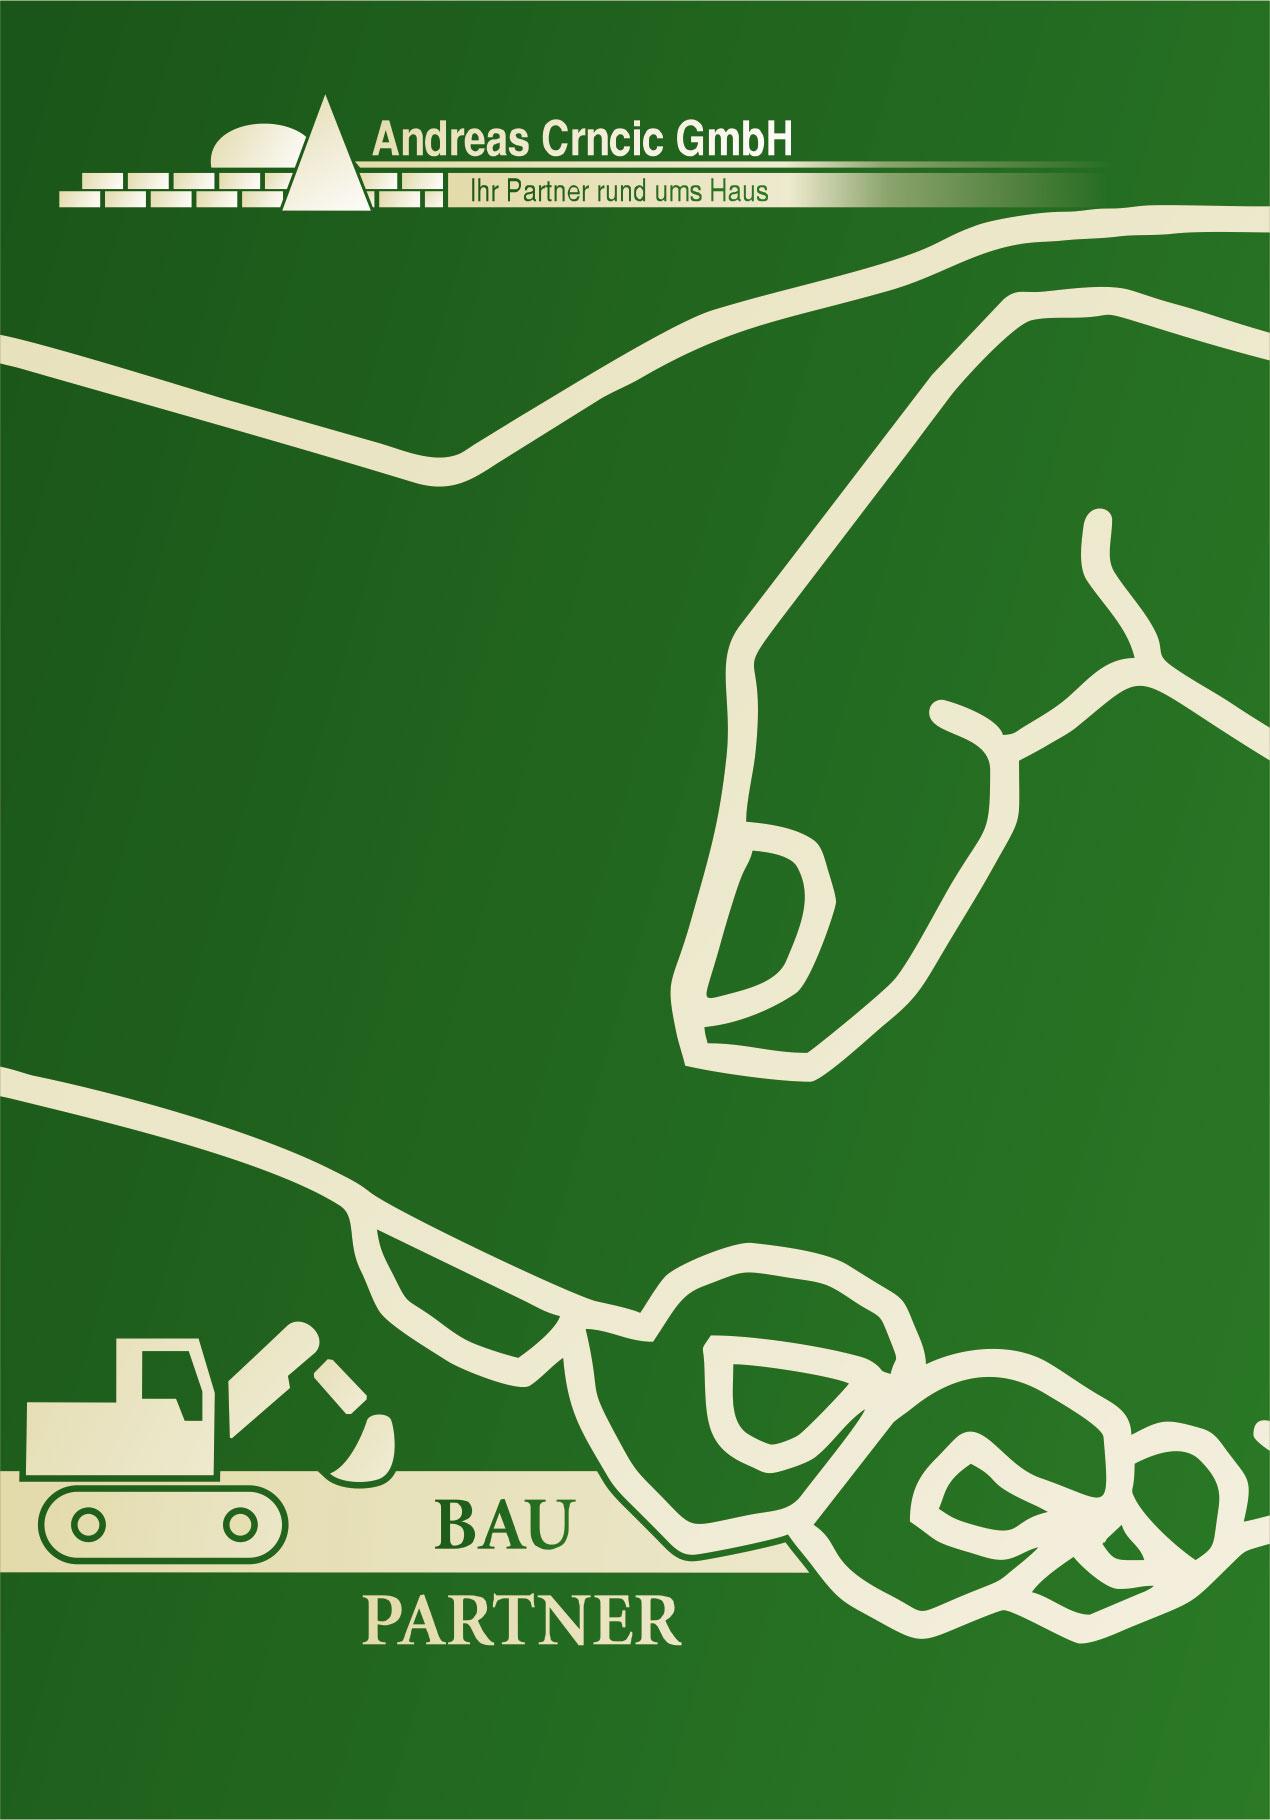 Crncic Bauunternehmen - BAU PARTNER